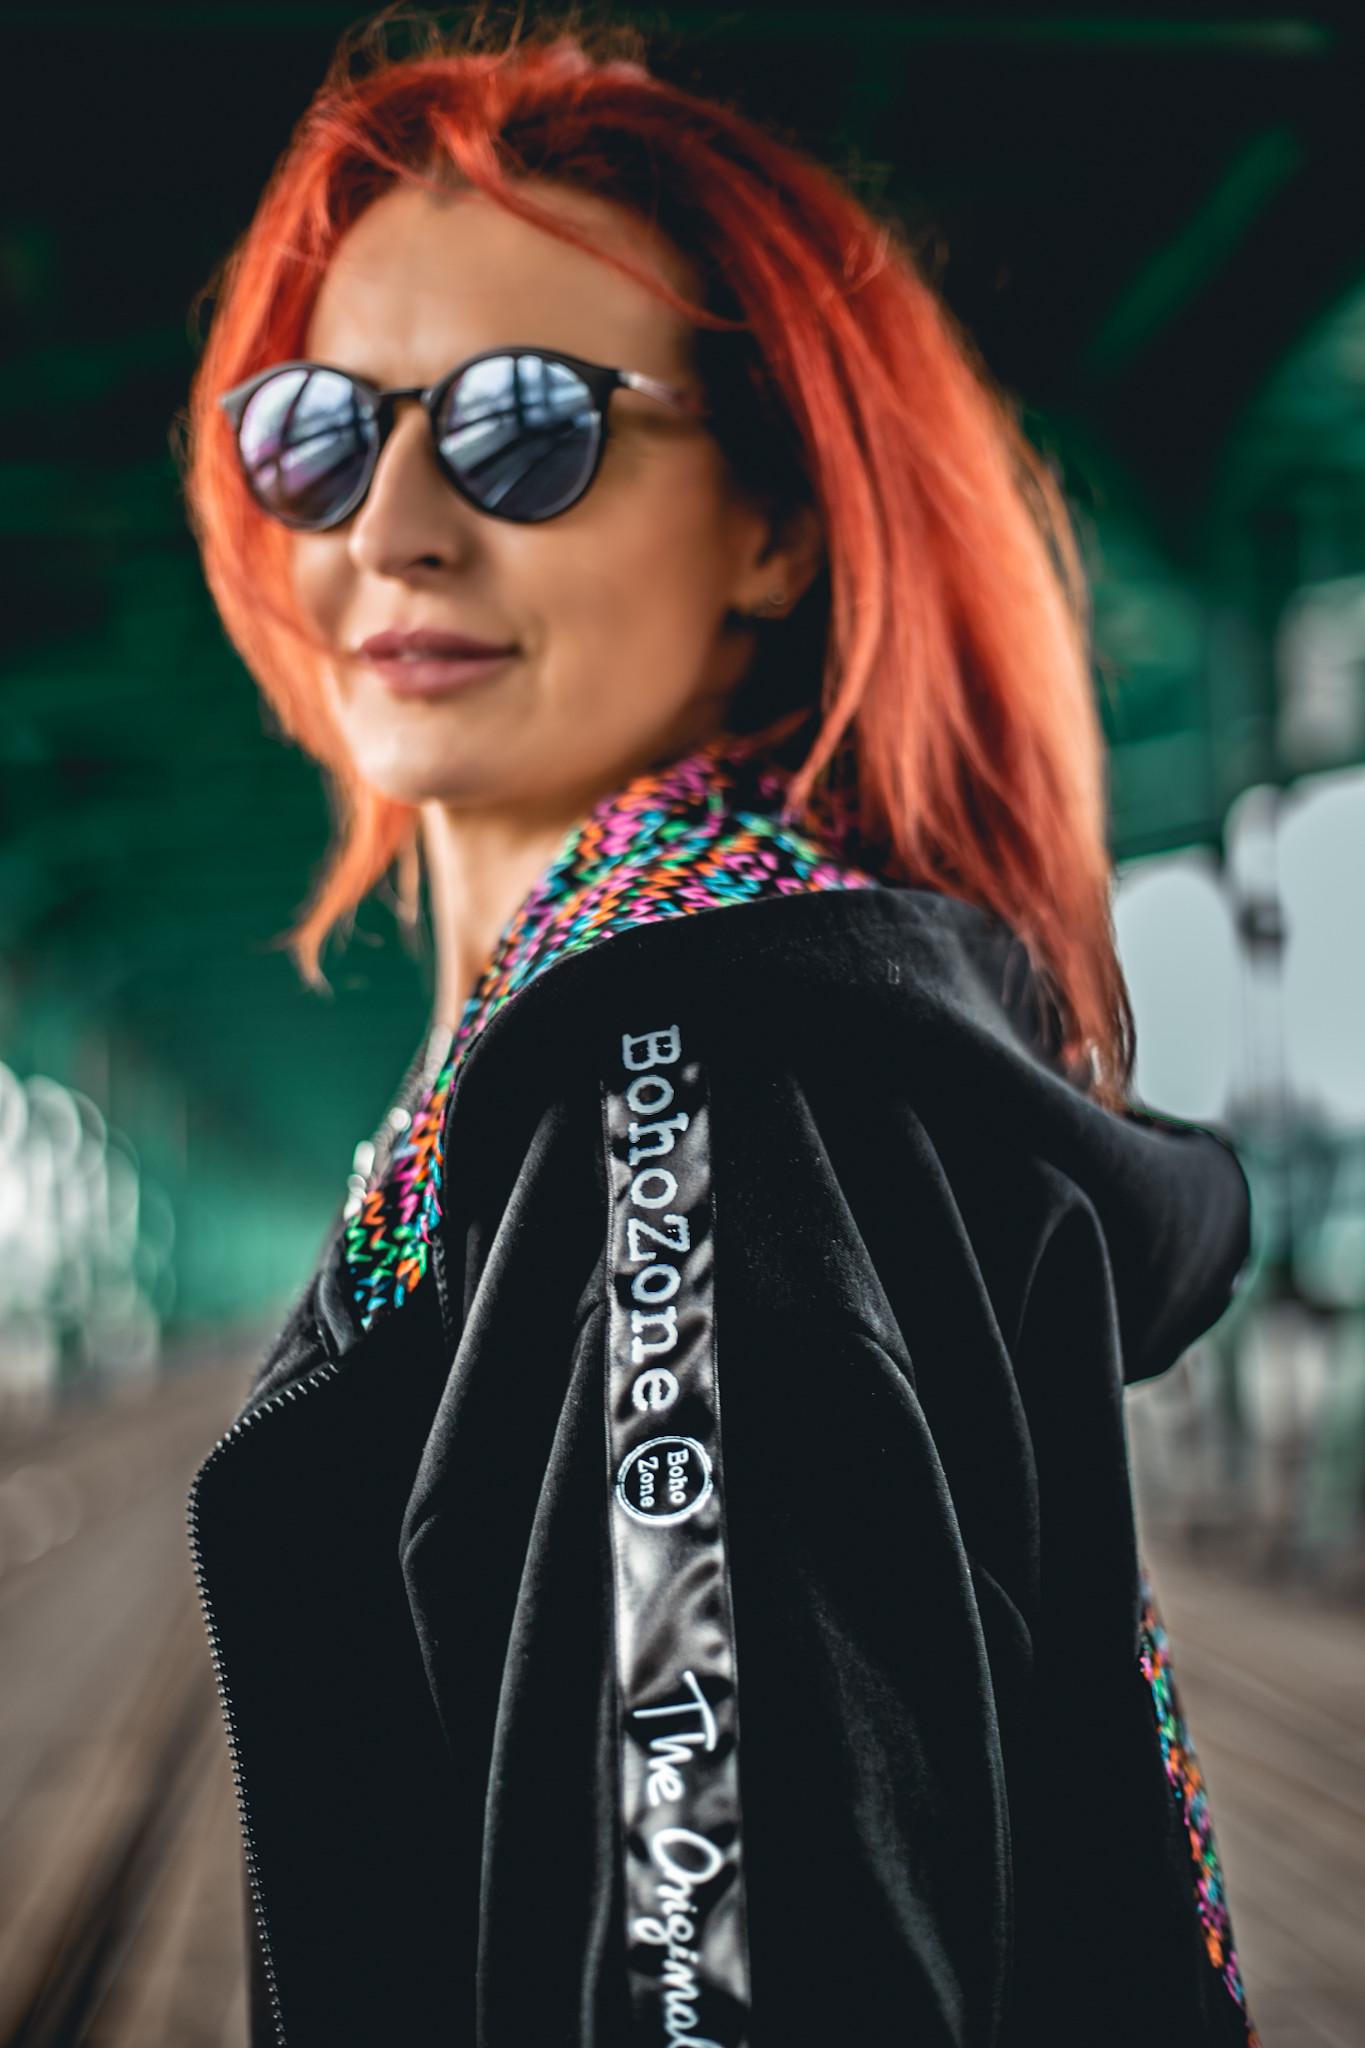 All Black Parka Czarna Landryna VOL 2 - BohoZone   JestemSlow.pl